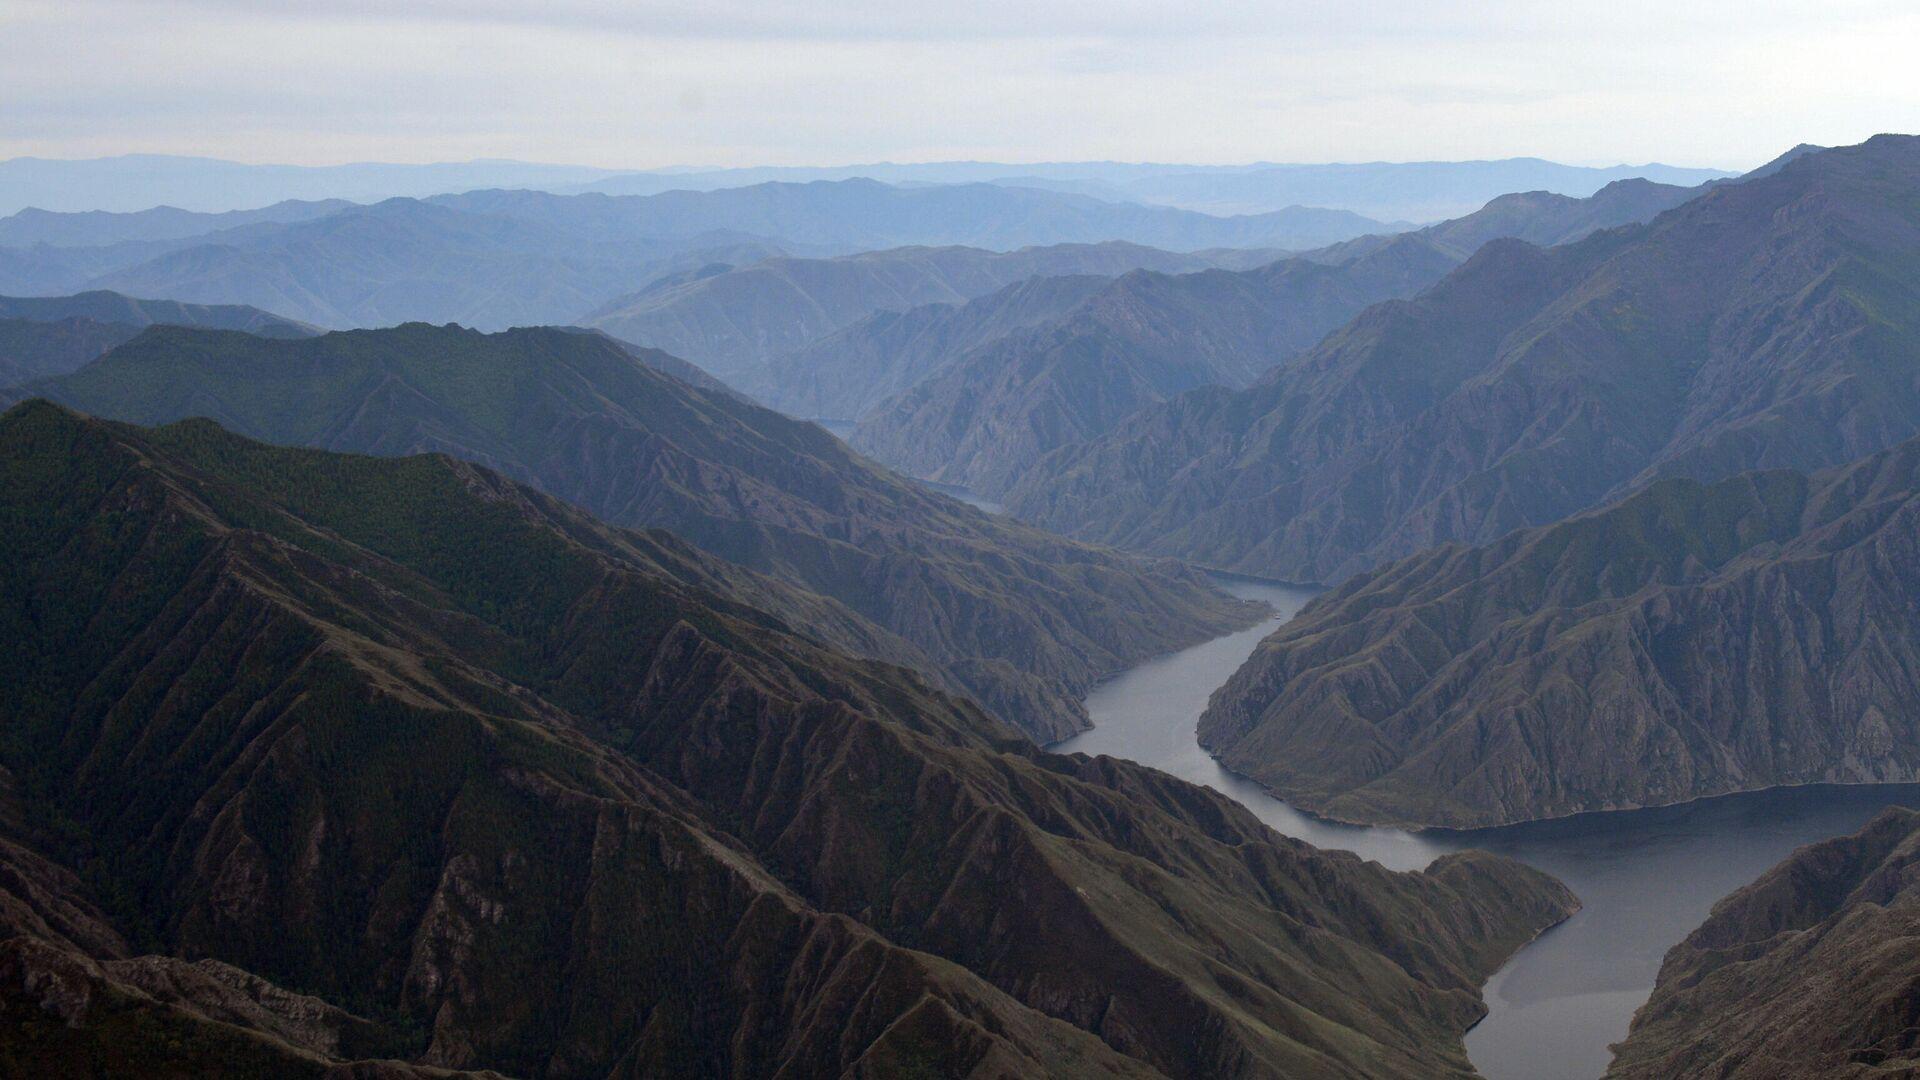 Ученые восстановили климат Сибири за последние 9000 лет